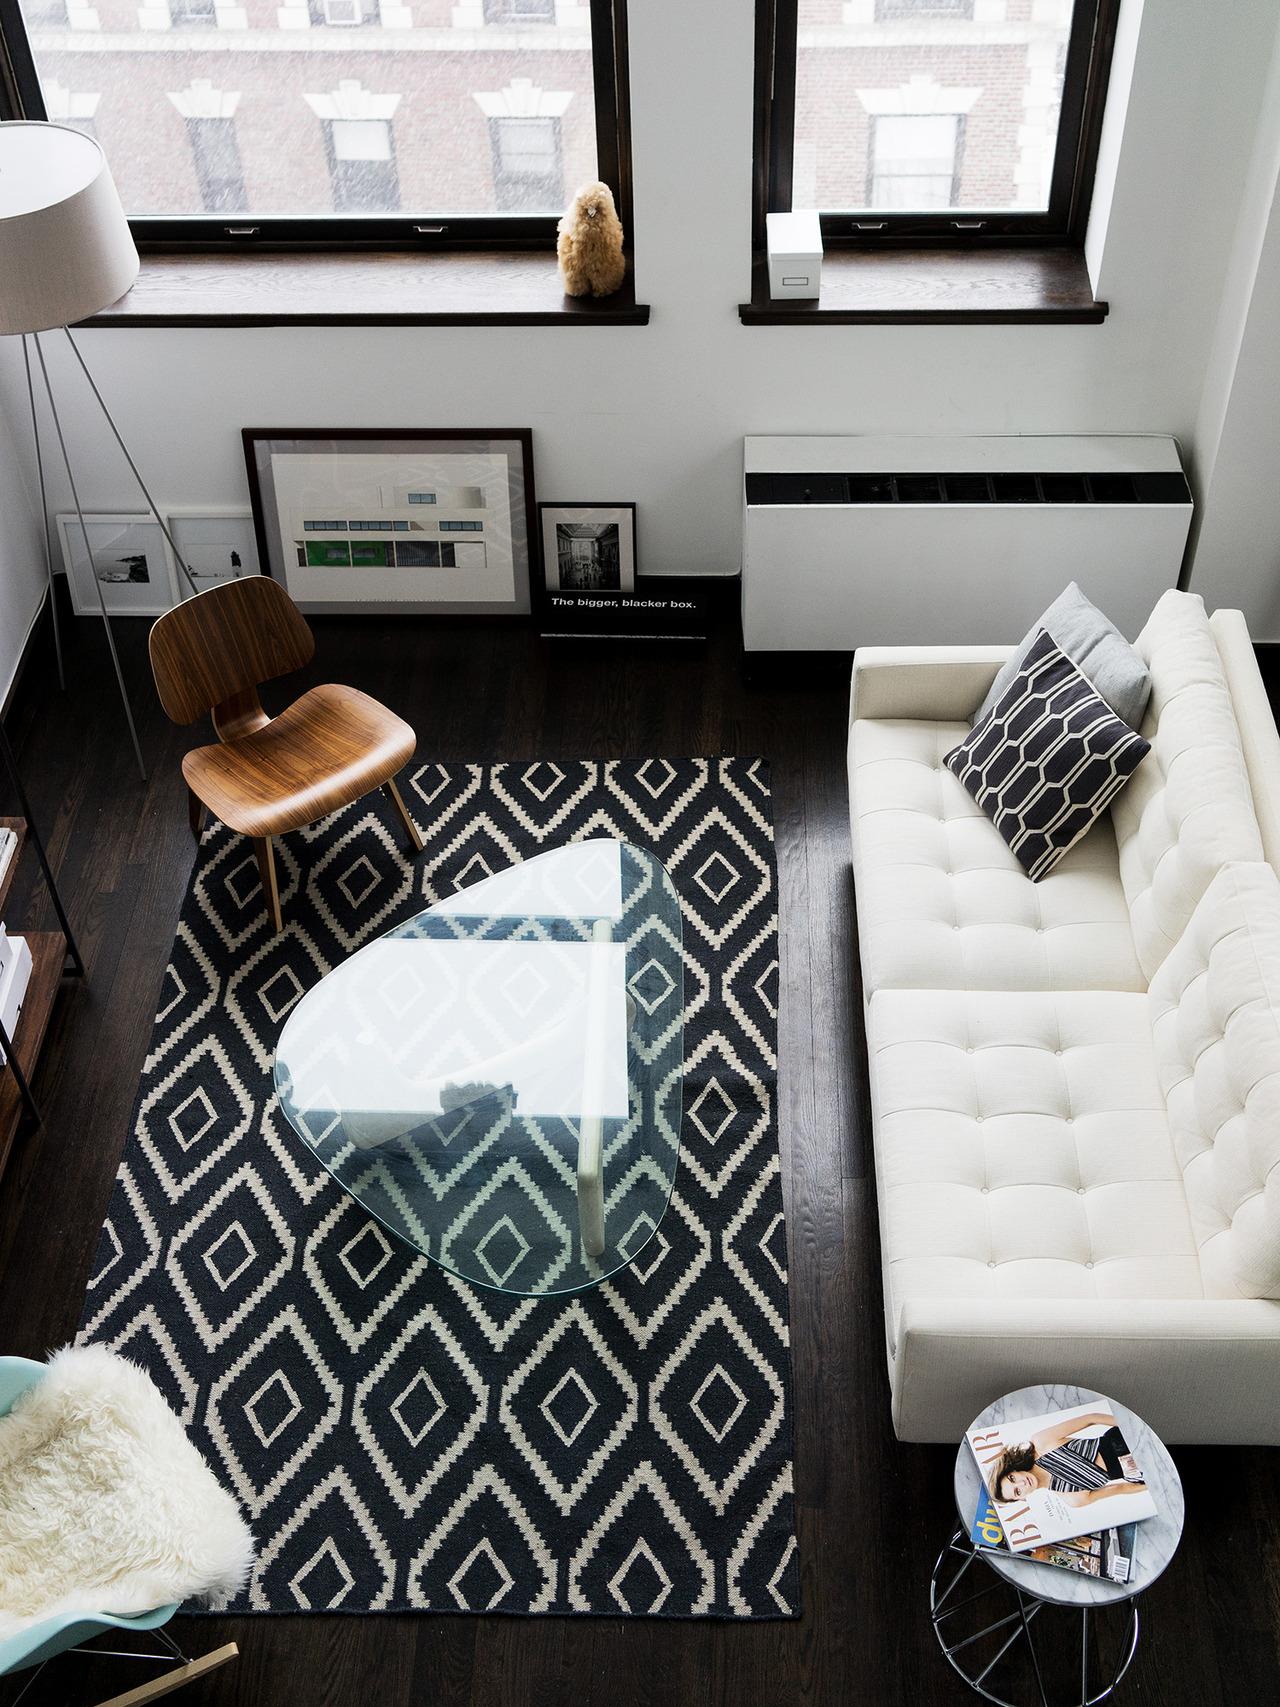 Loft Interior Tumblr Collection #2